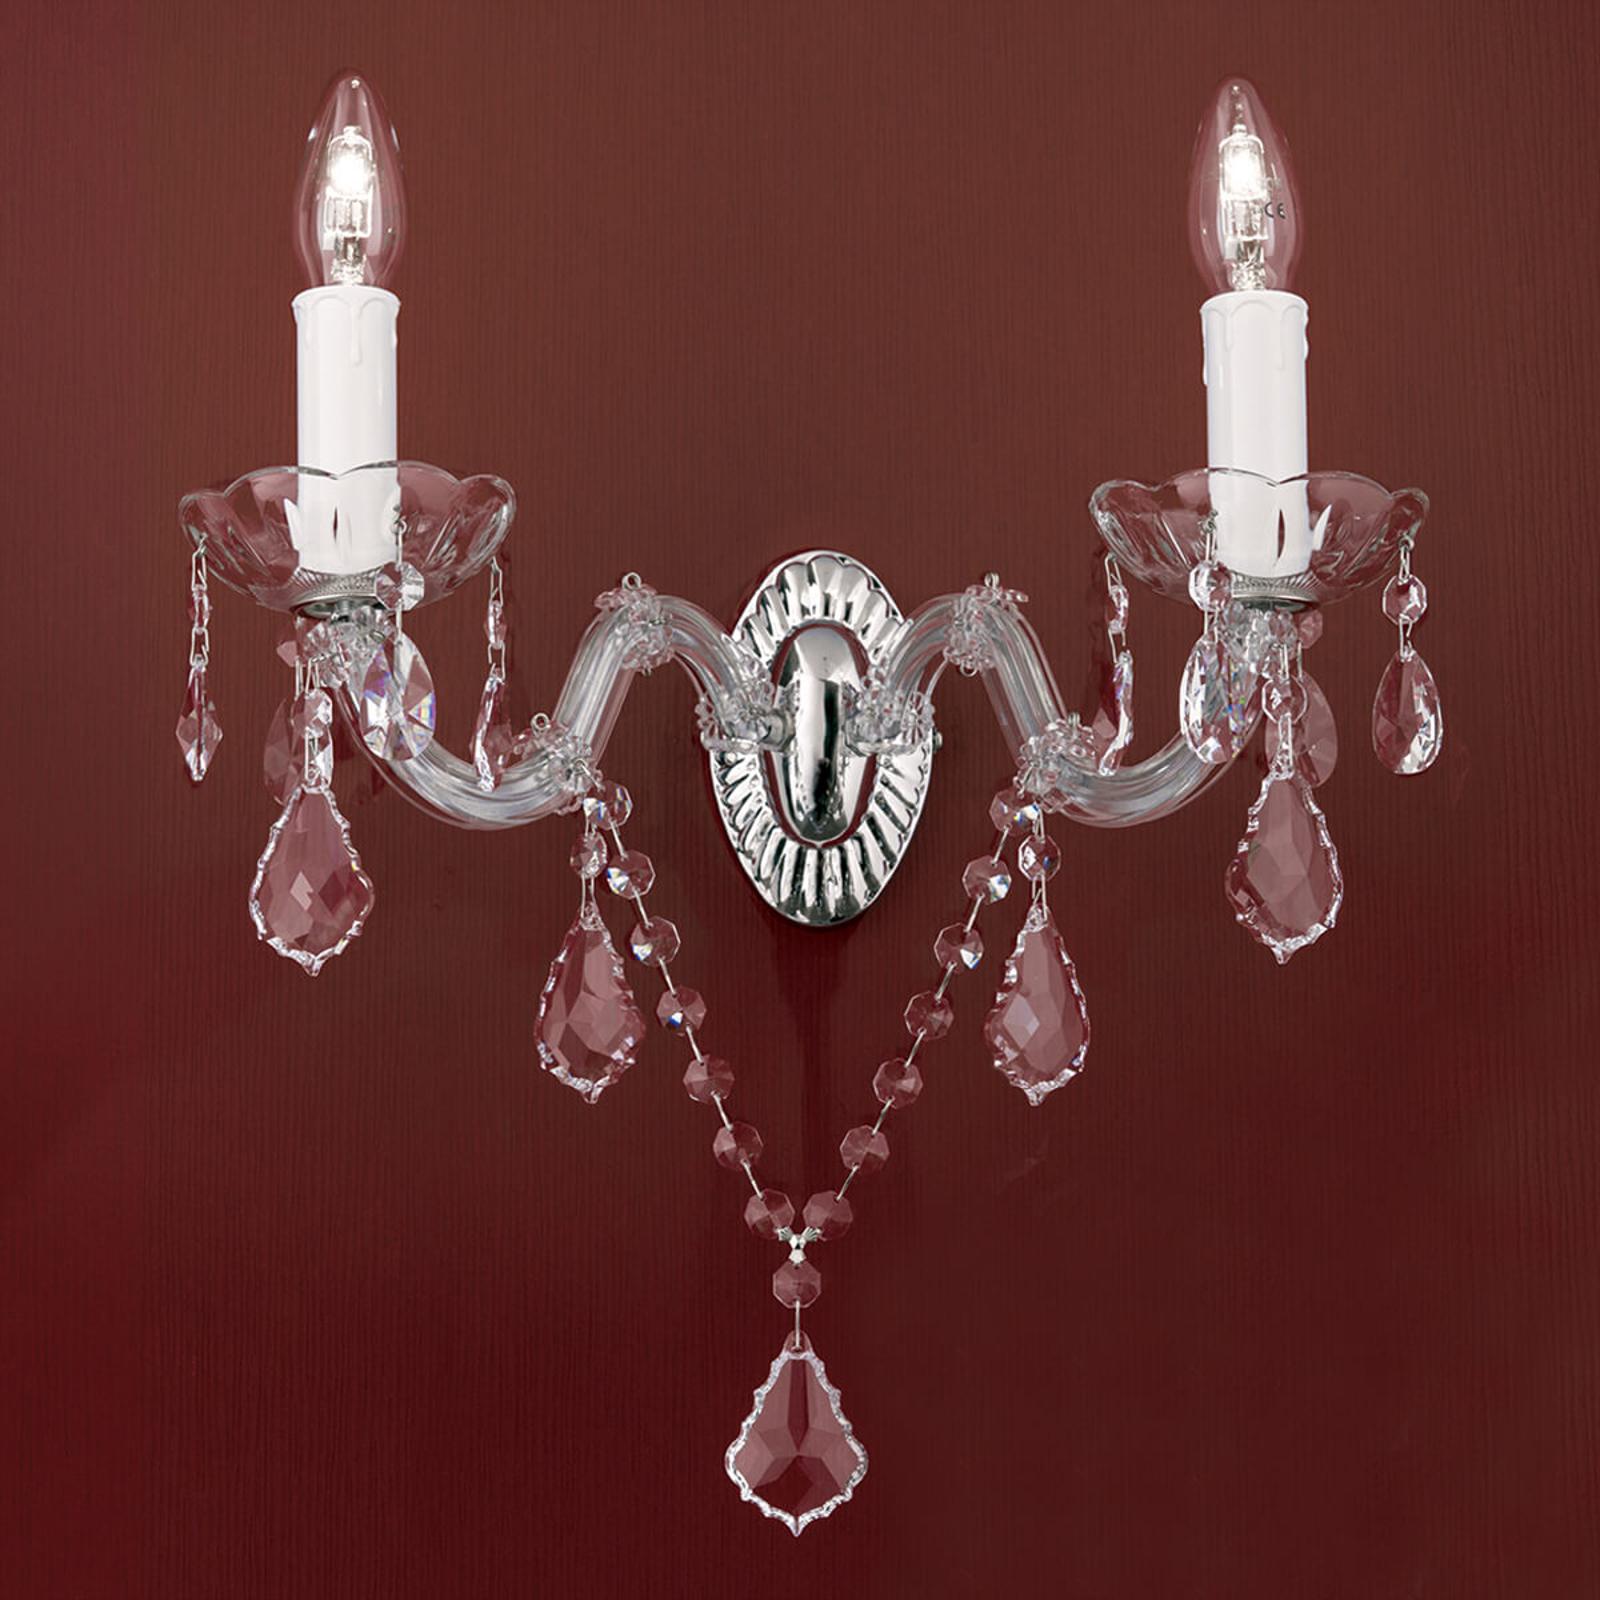 Kristallvägglampa Maria Teresia